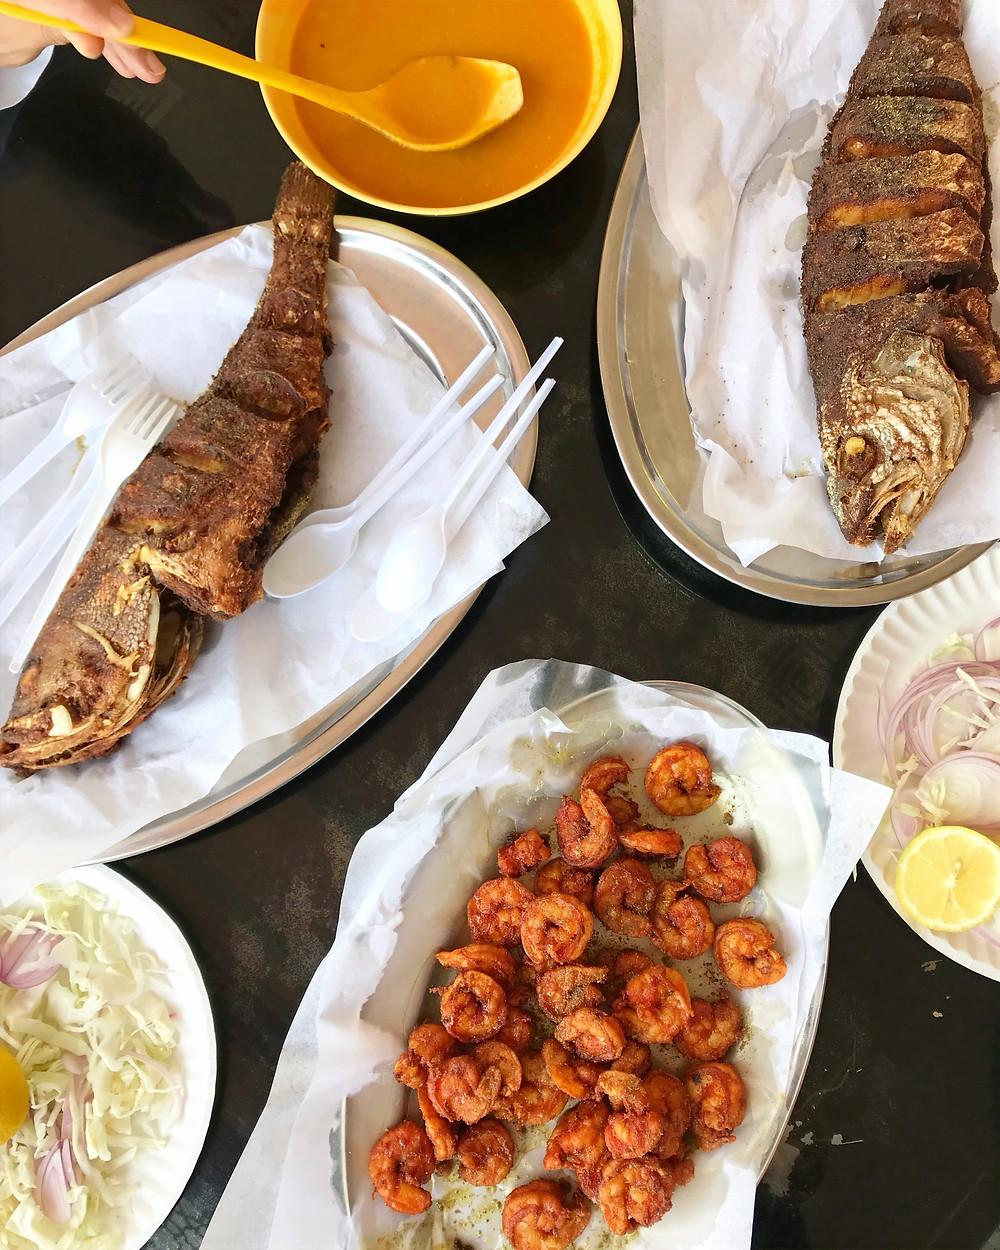 Fish and prawns at Bu Qtair restaurant